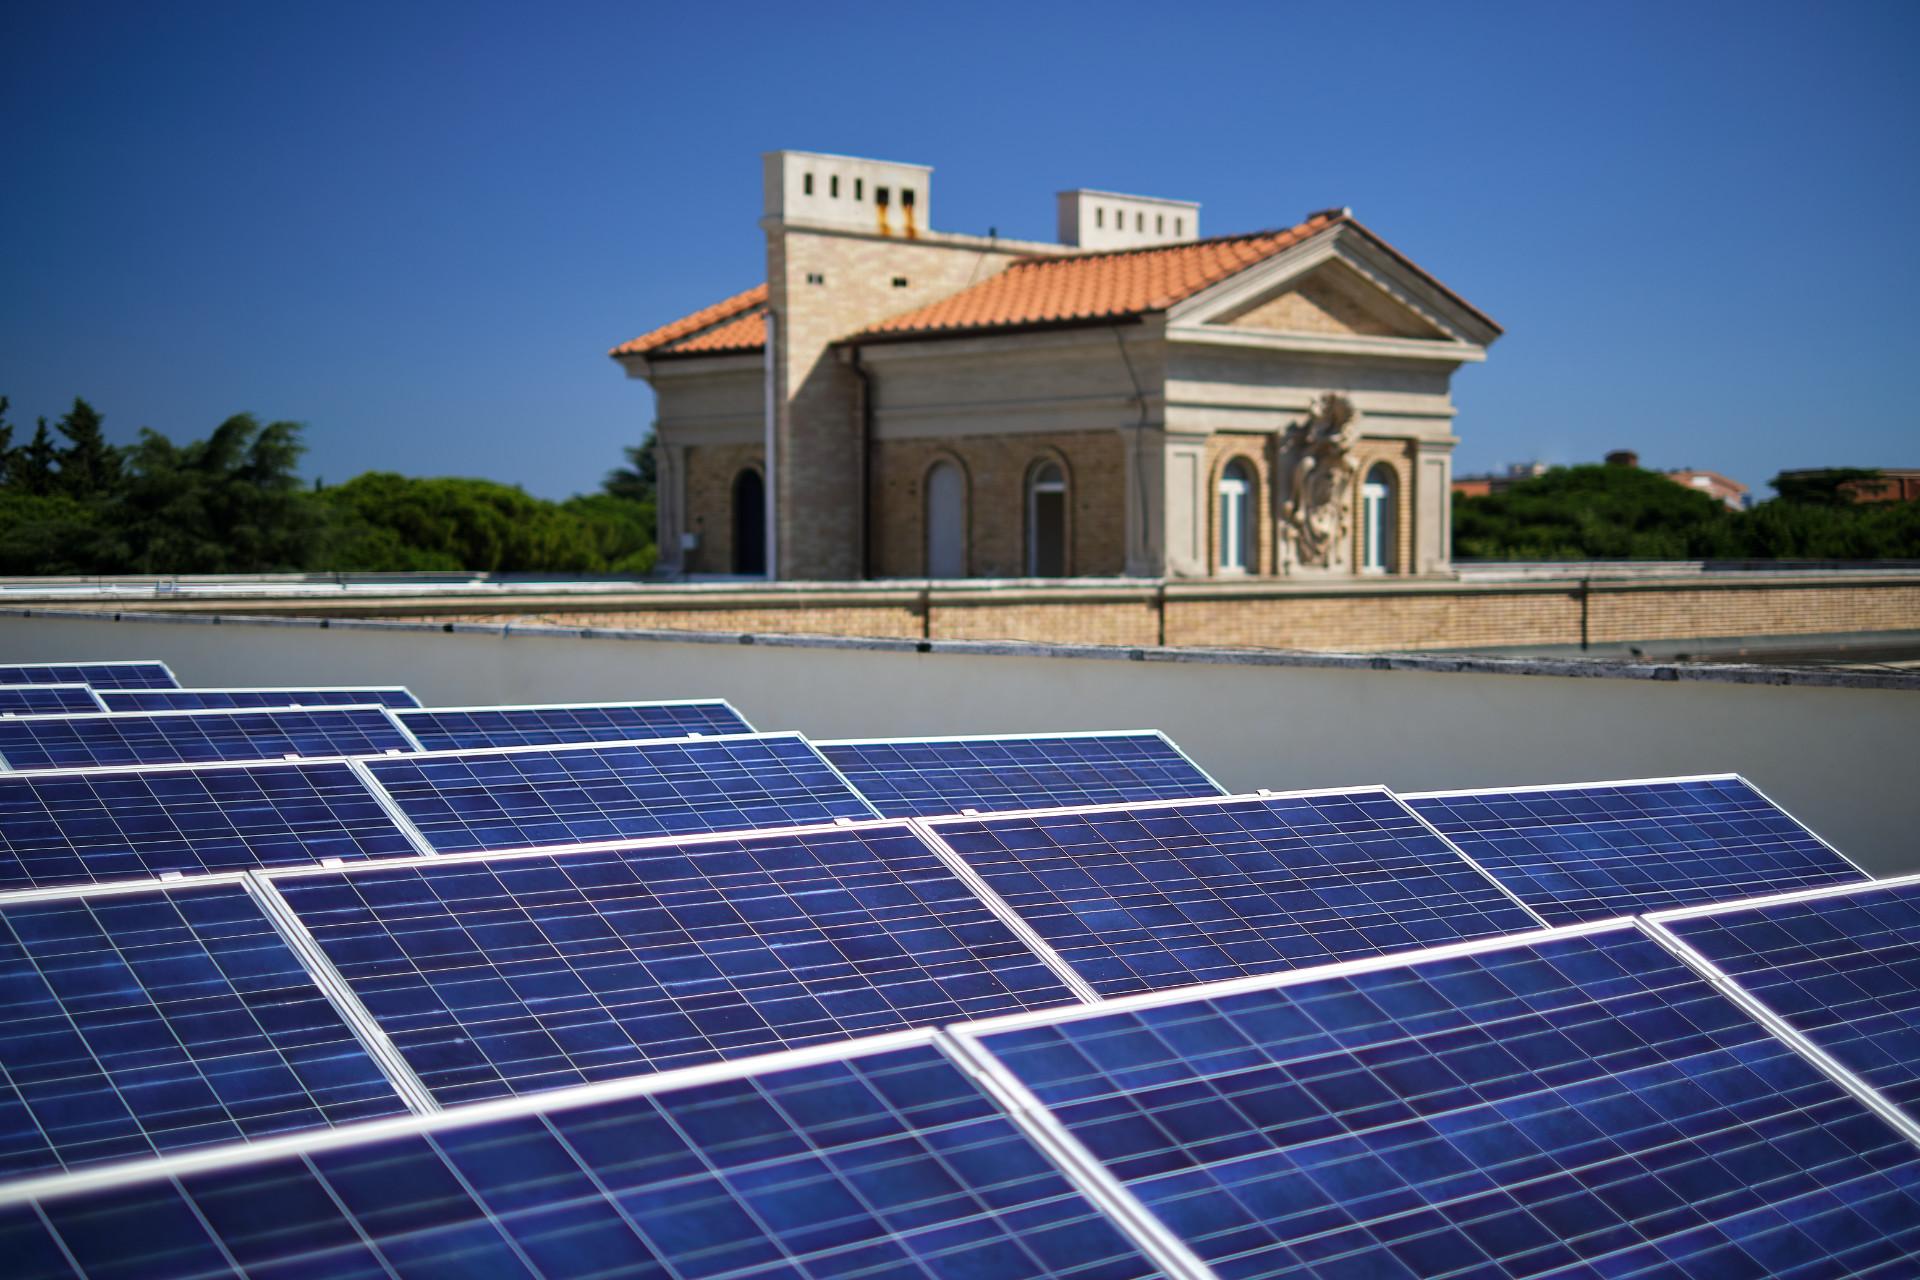 Impianto Fotovoltaico Pio Brasileiro 2